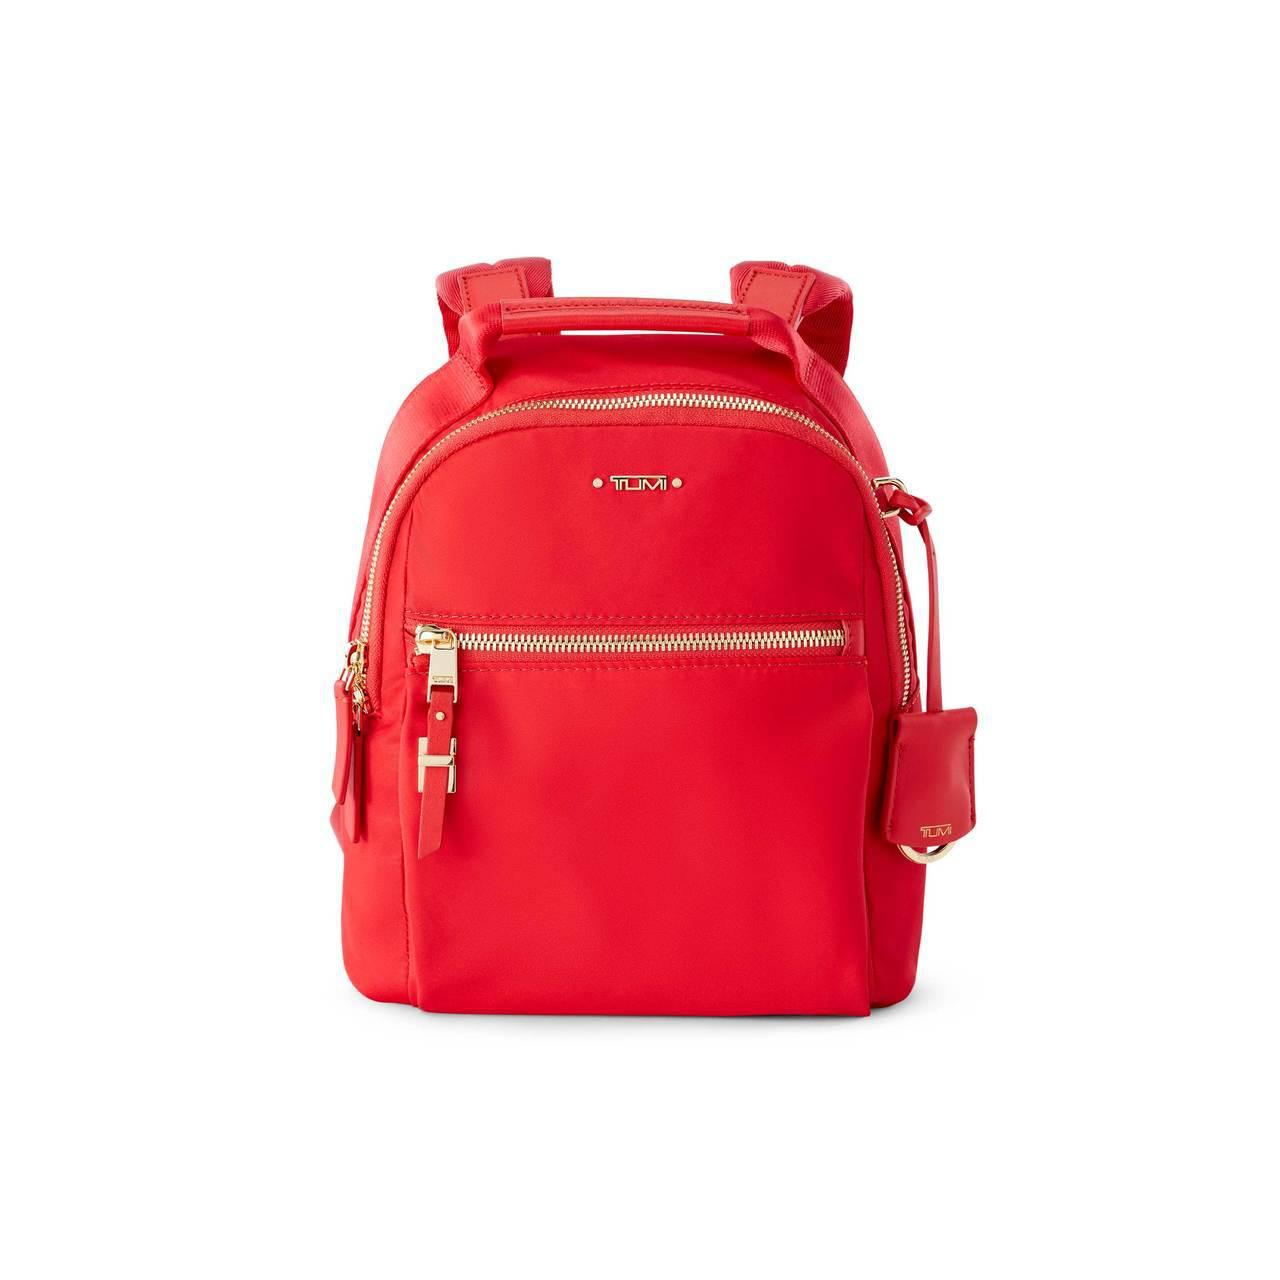 VOYAGEUR系列夕陽紅Witney後背包,13,500元。圖/TUMI提供